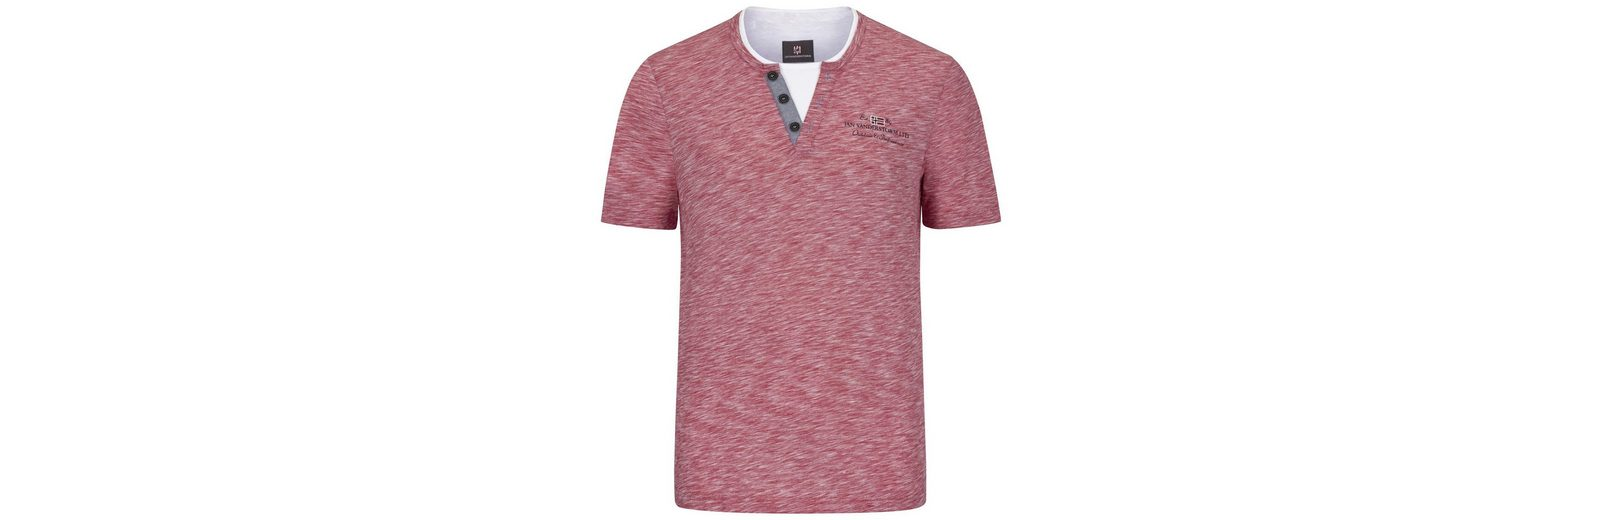 Jan Vanderstorm T-Shirt GUNTHARD Frei Versandkosten Günstig Kaufen Exklusiv hjB5jLB